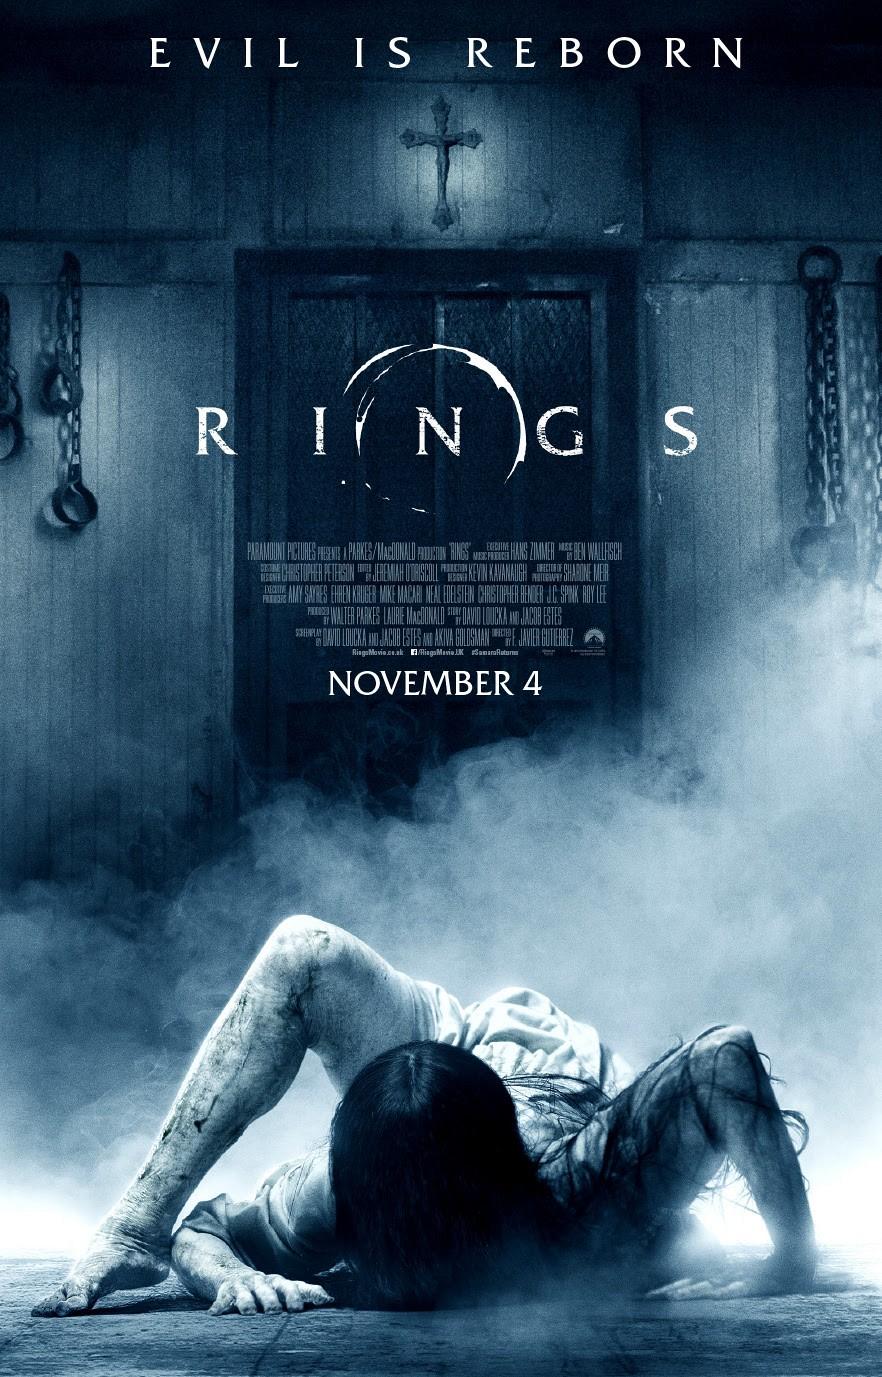 http://img5.downloadha.com/hosein/Movie/April%202017/Rings-2017-cover-large.jpg